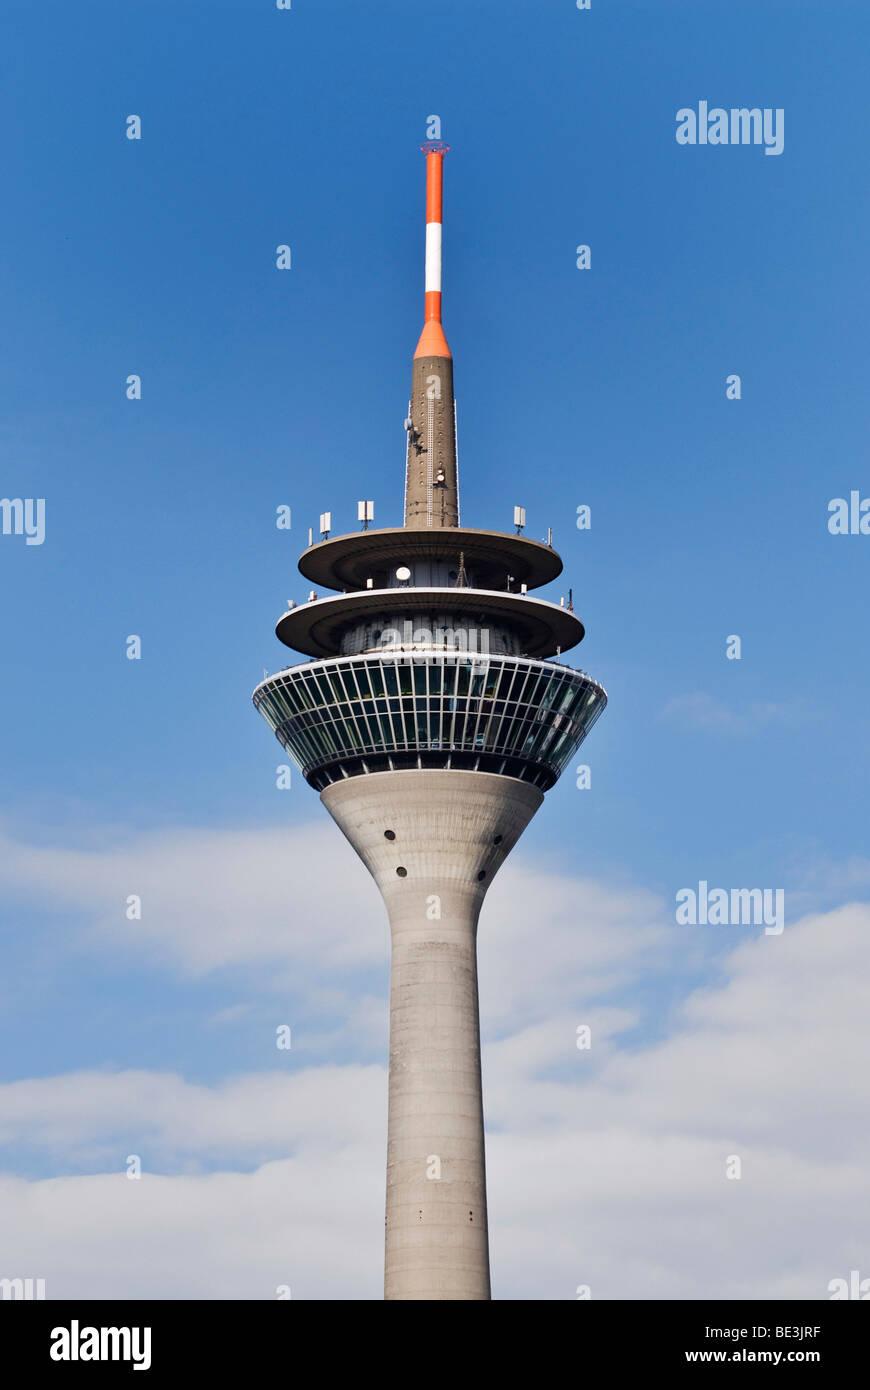 Rheinturm tower, restaurant, viewing platform and antennas on the tower, Duesseldorf, North Rhine-Westphalia, Germany, - Stock Image